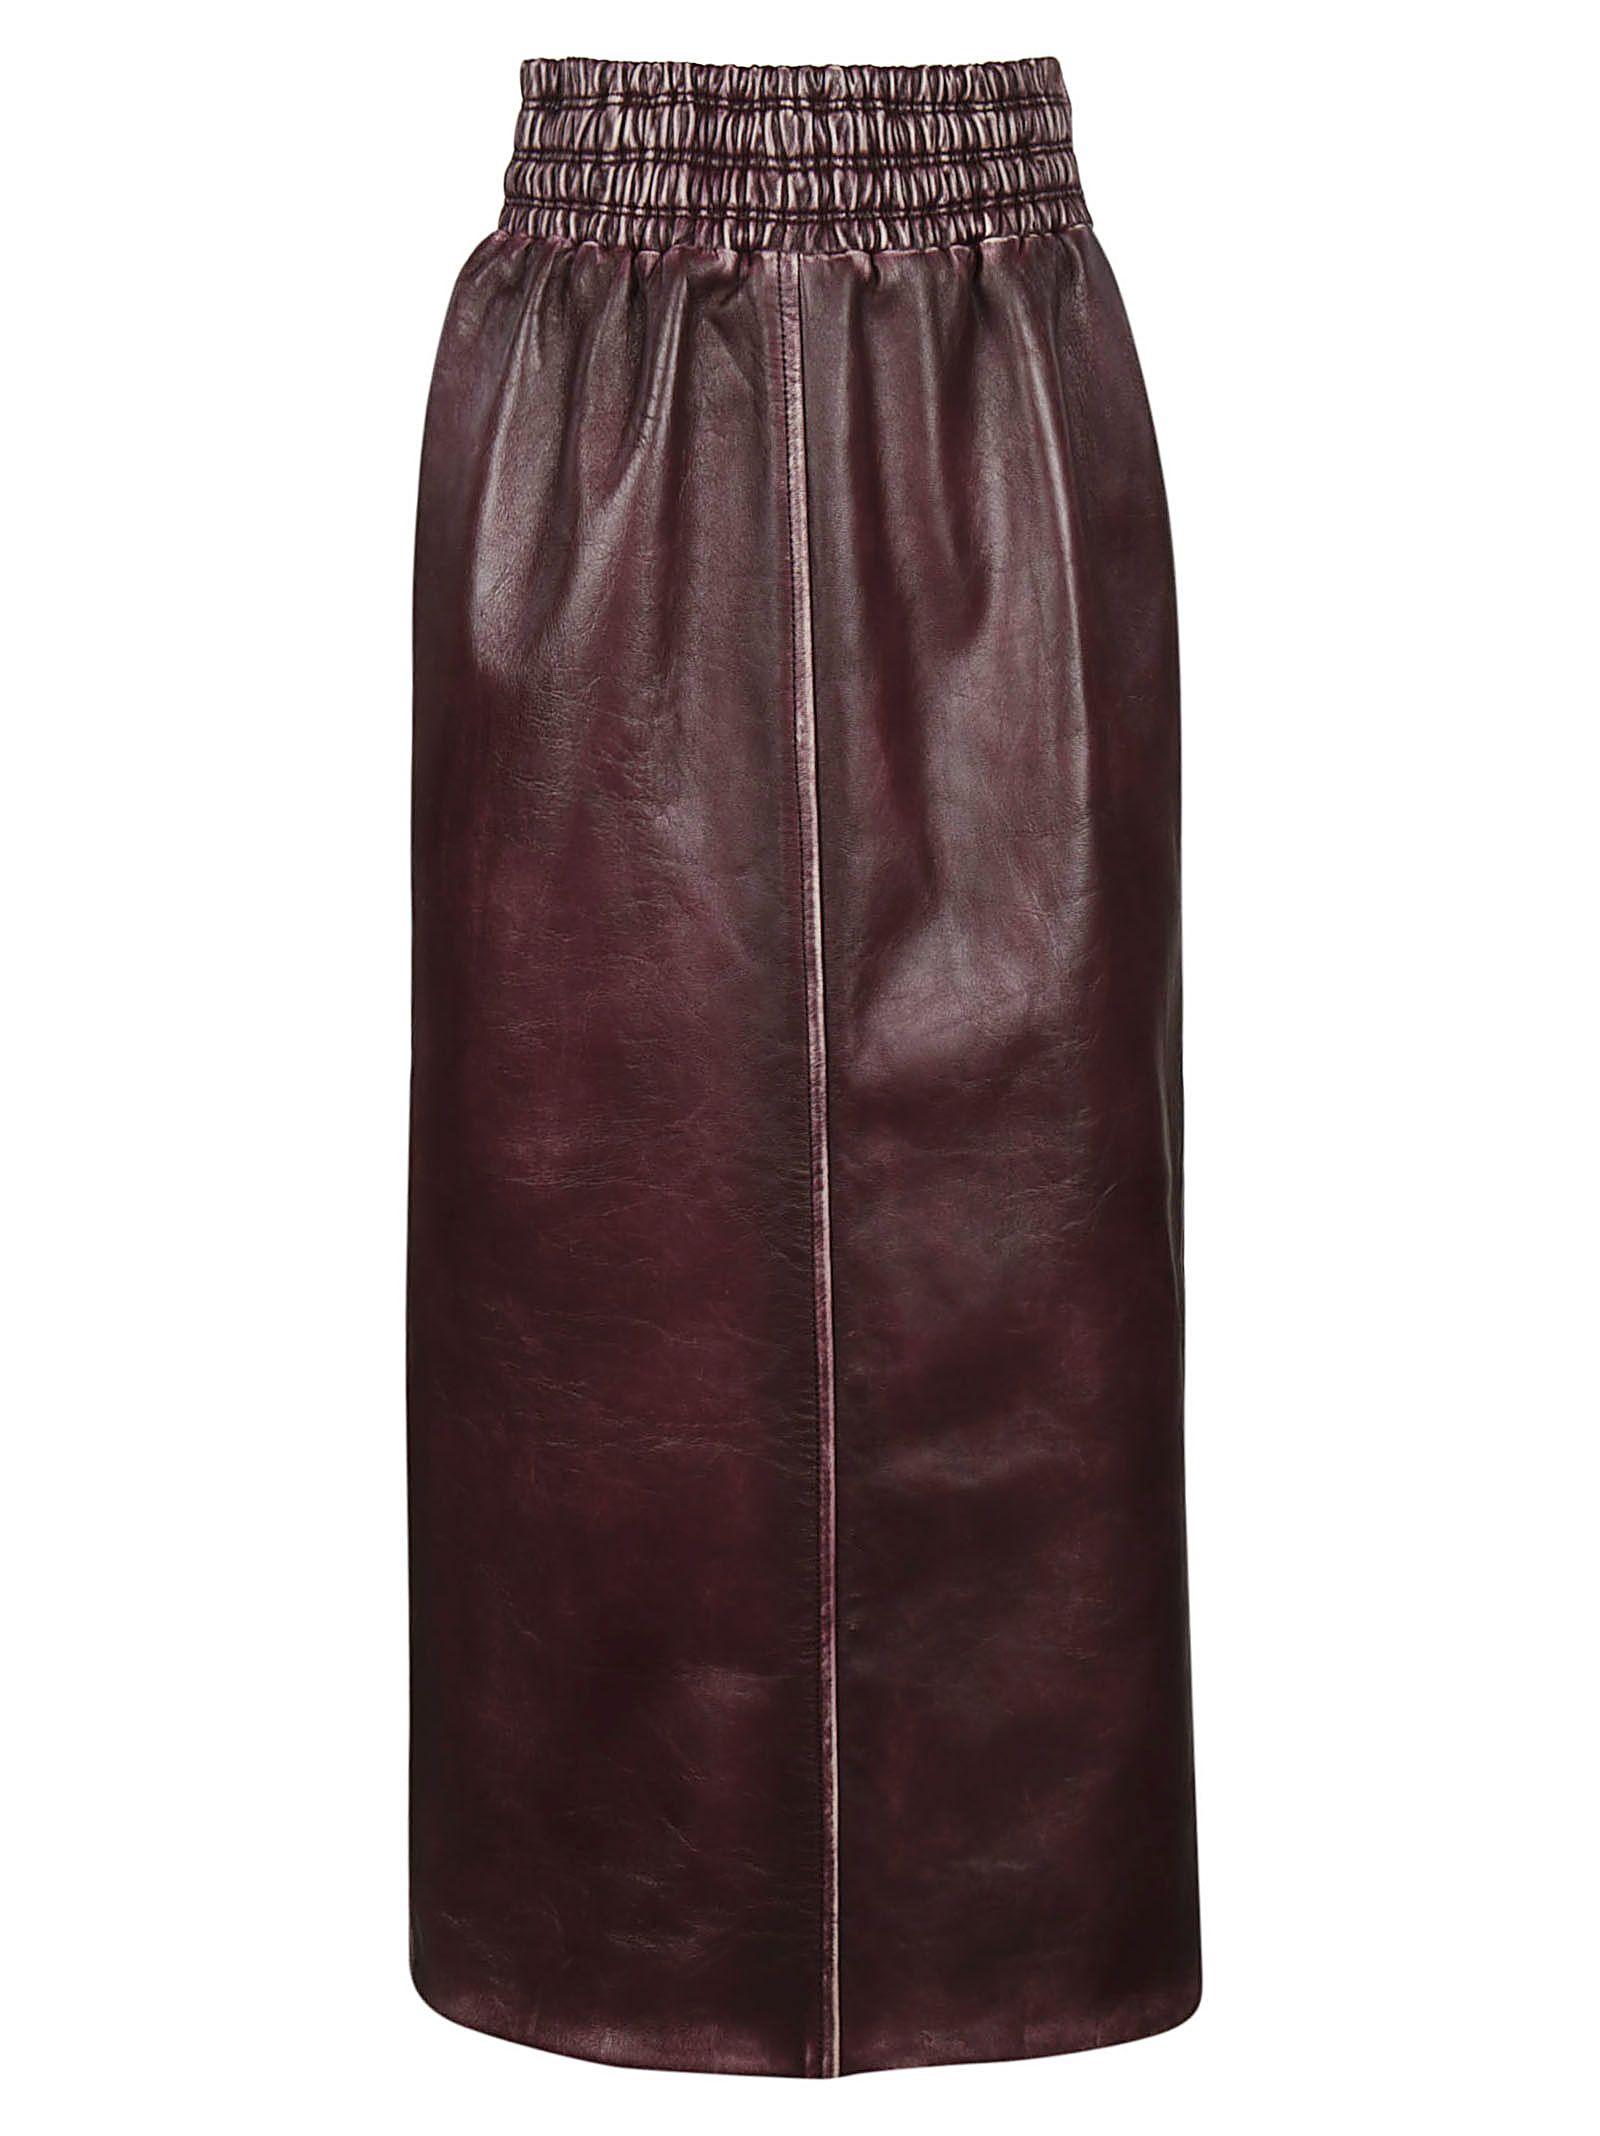 miu miu -  Vintage Effect Leather Skirt